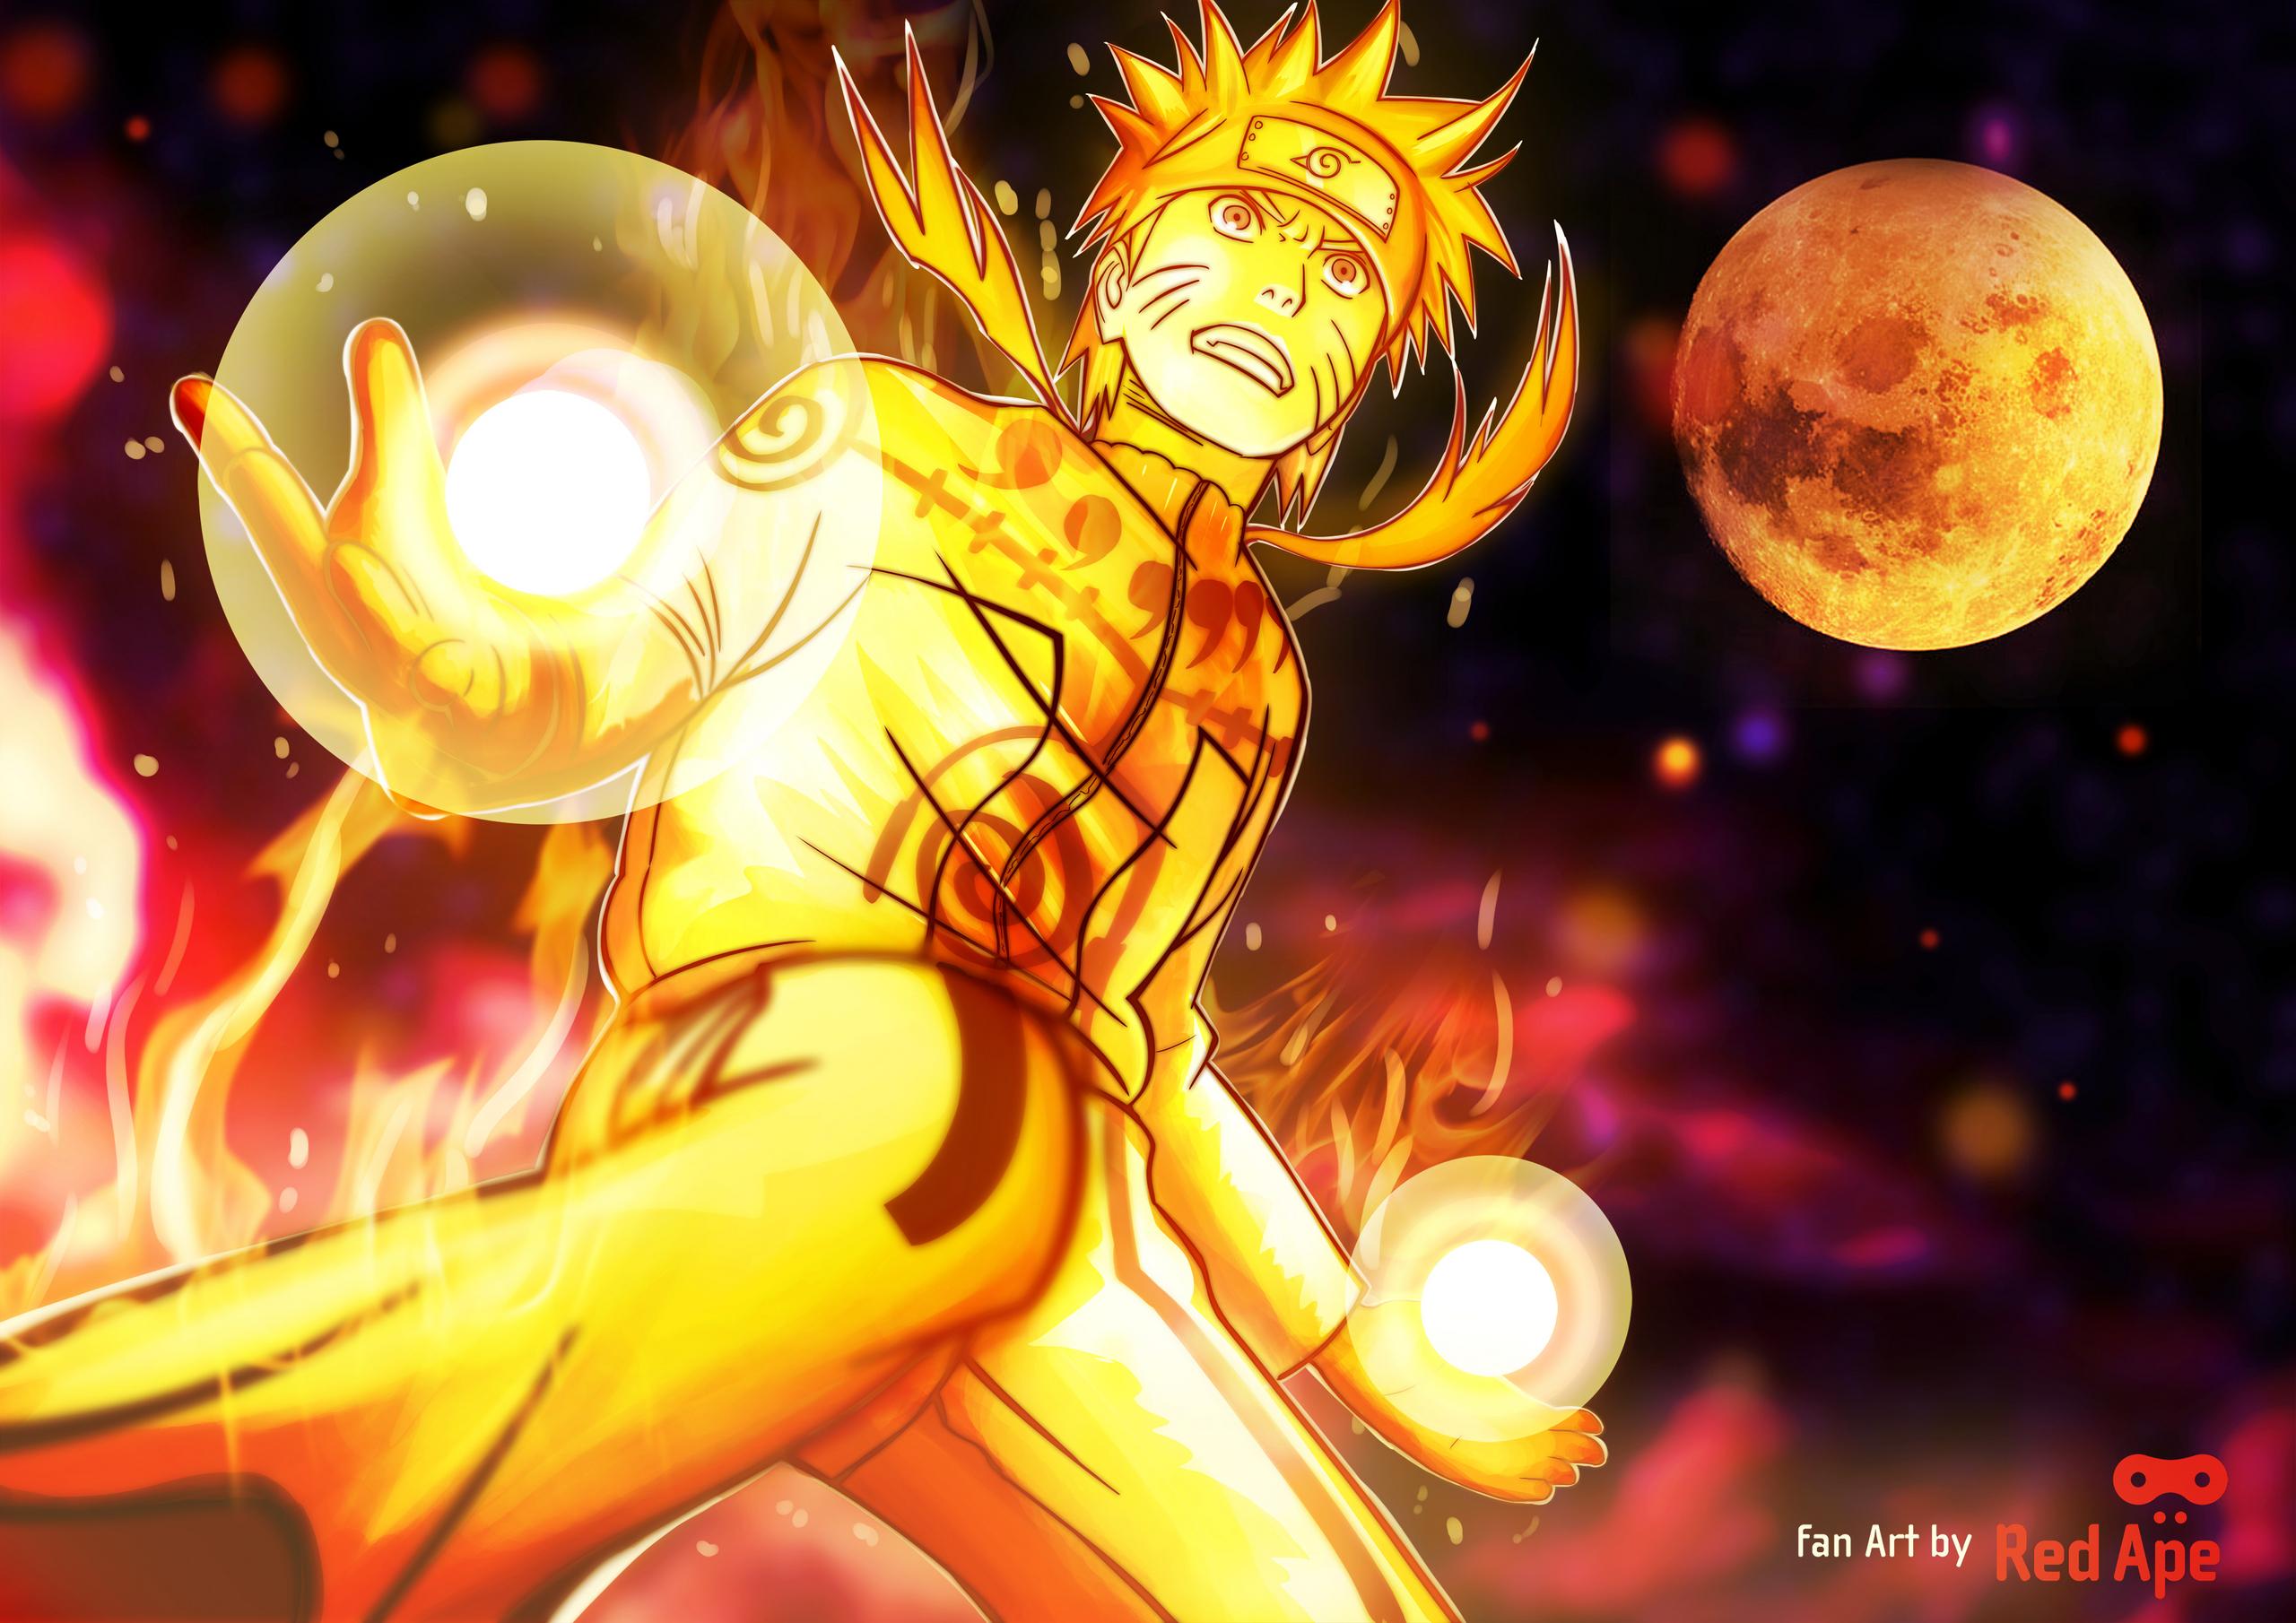 Naruto Shippuuden Hintergrund called 9 tales Kyuubi Mode